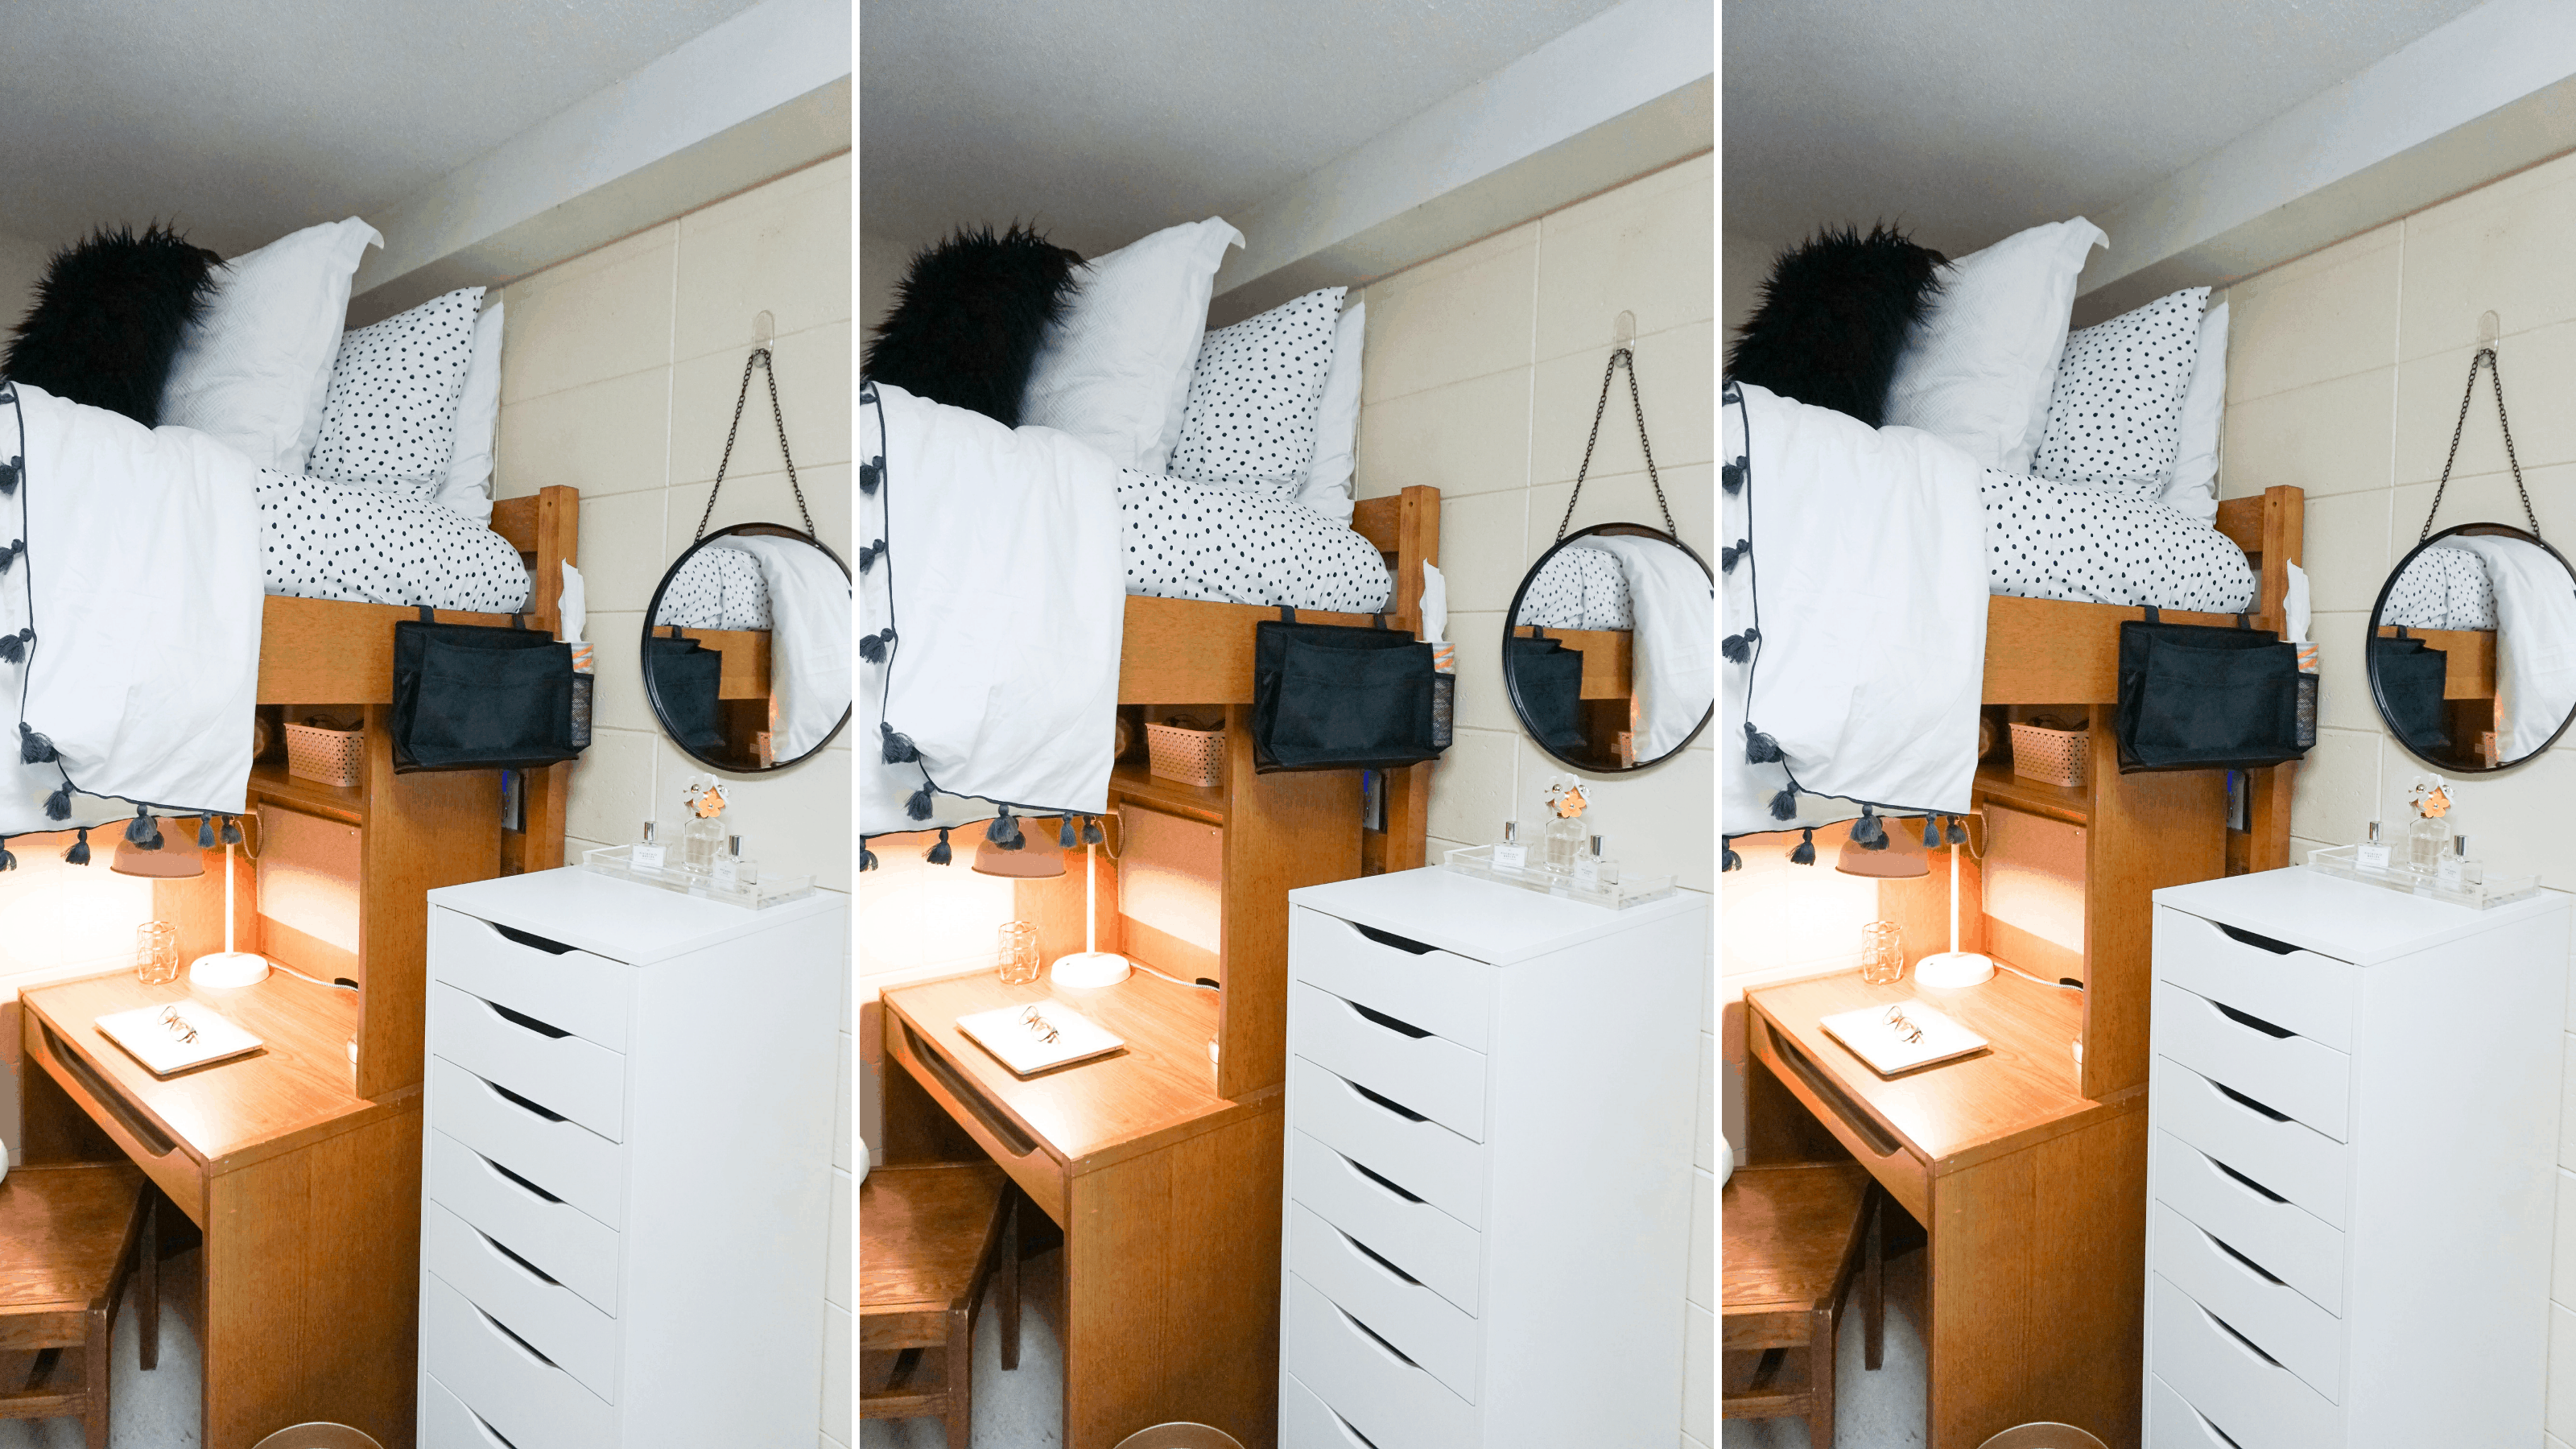 Dorm Room Storage Ideas 12 Brilliant Dorm Room Storage